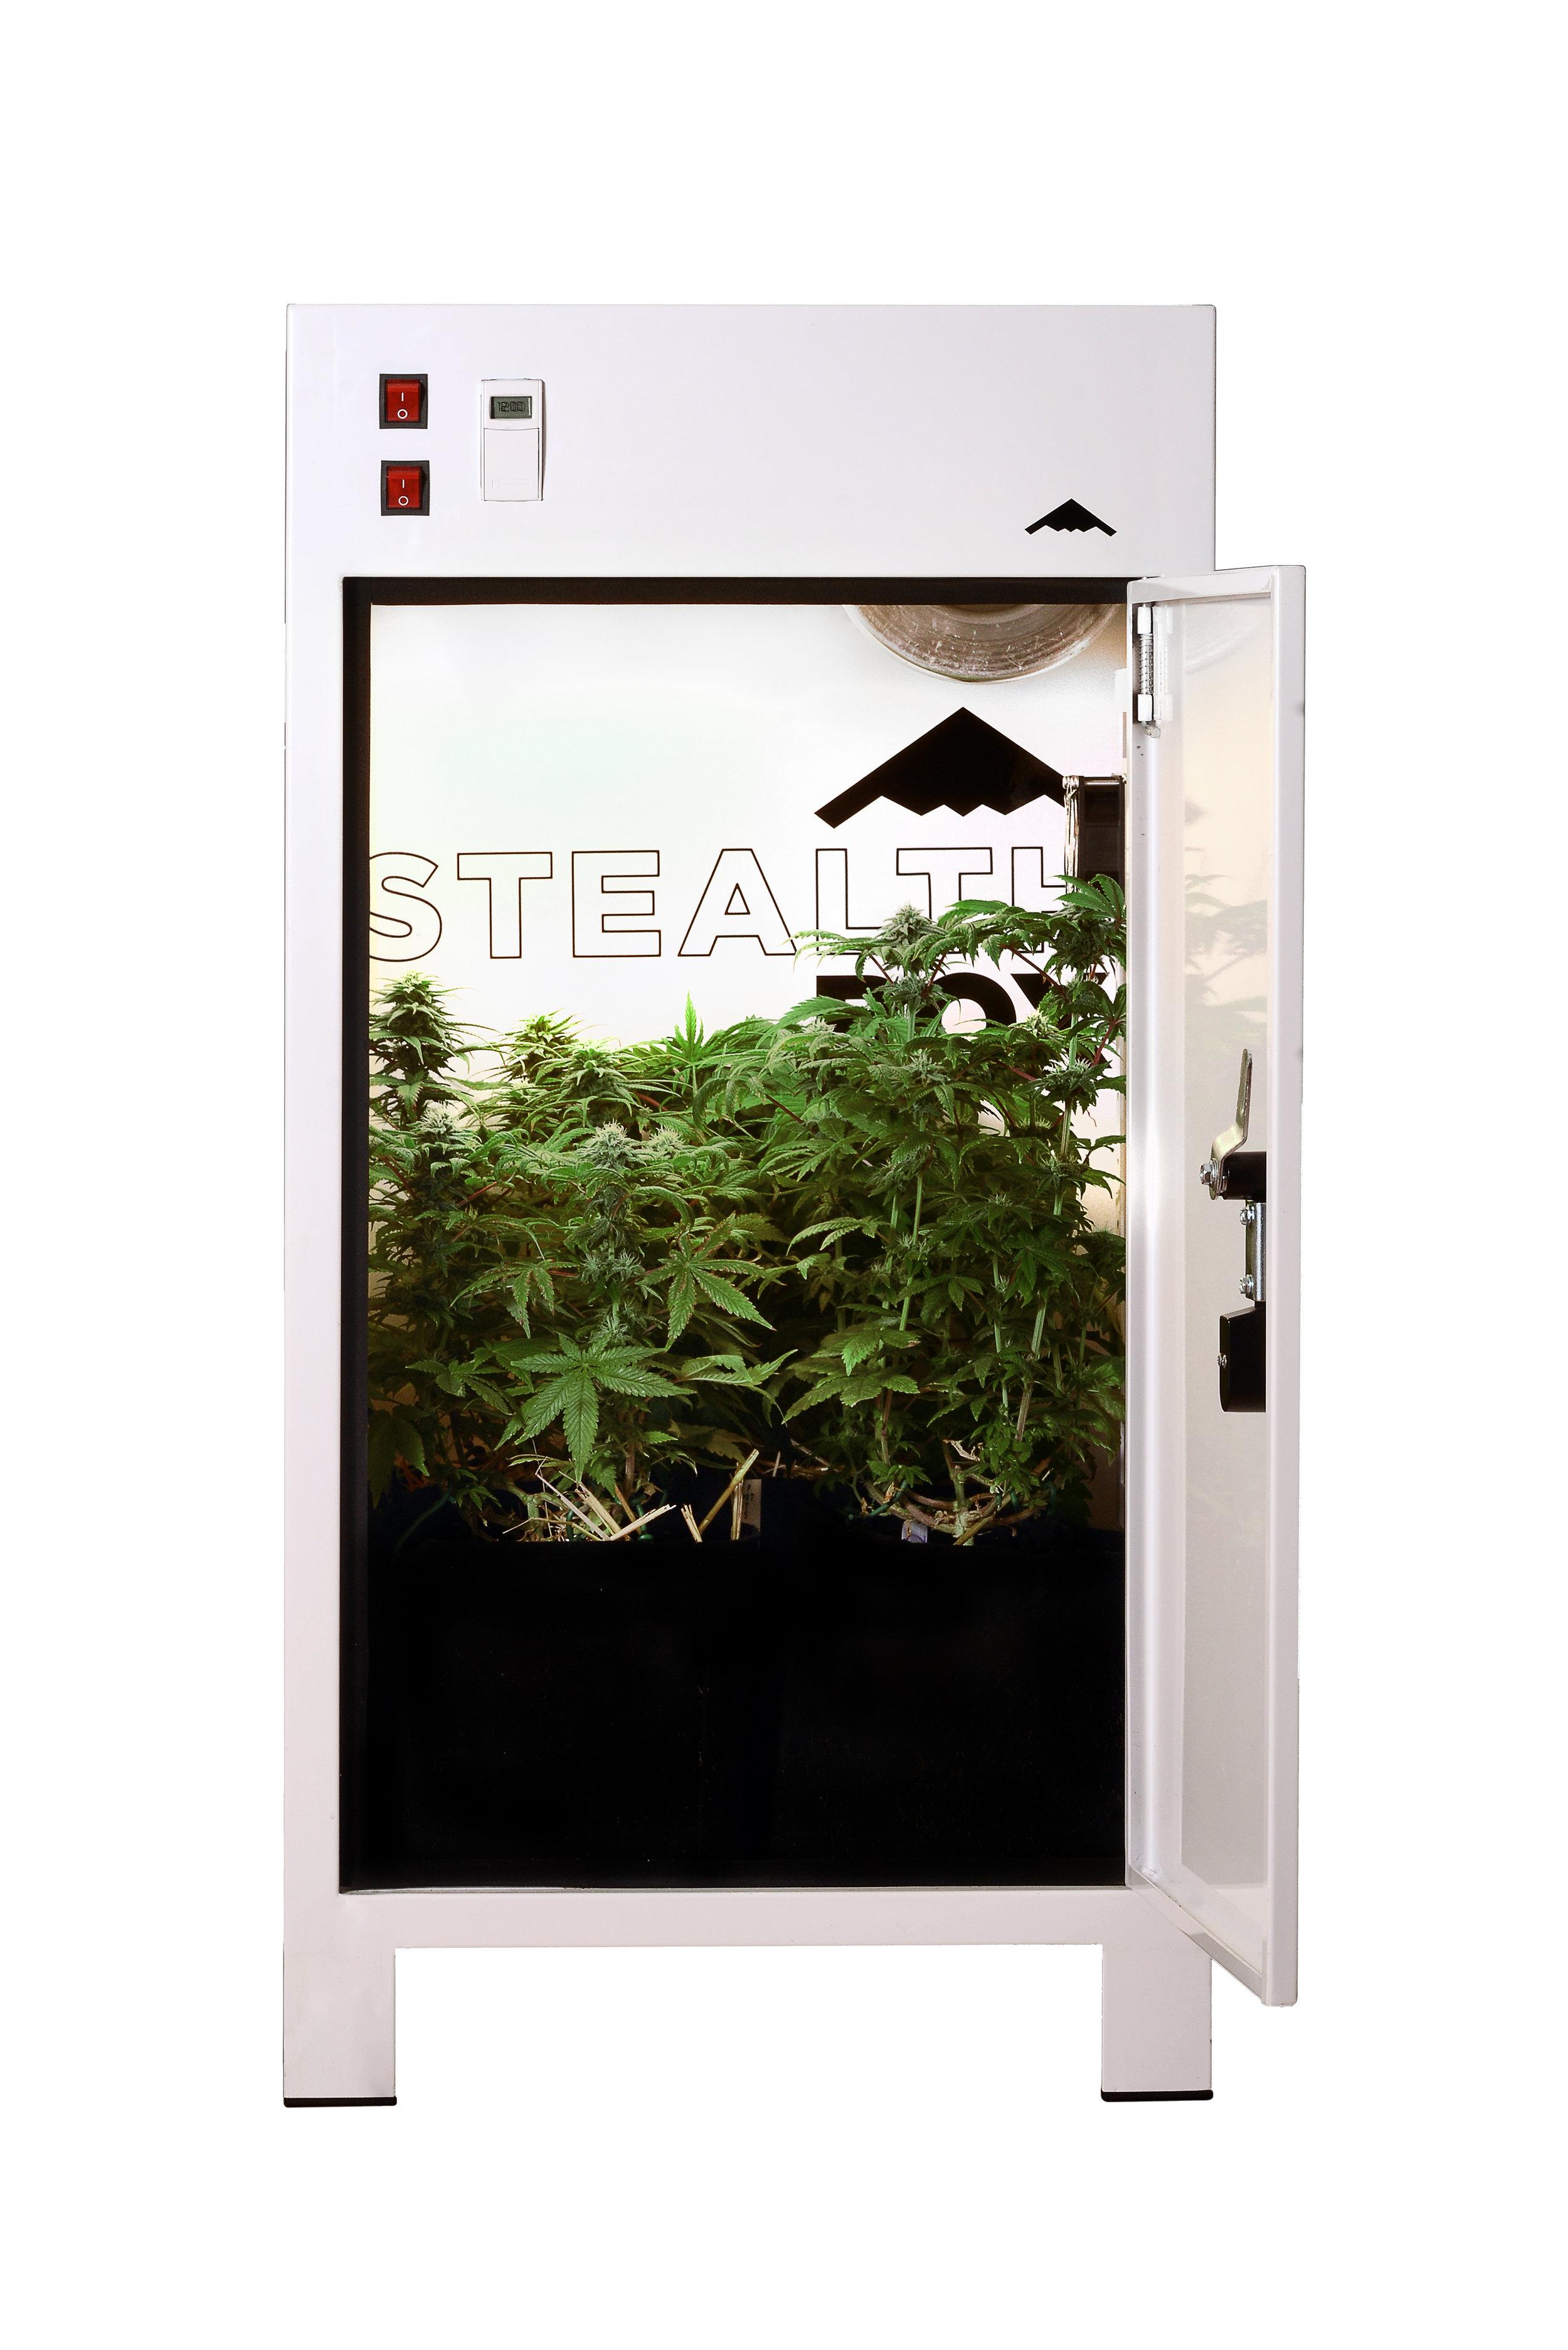 Stealth box - The Canadian Grow Box 🍁$1495 CAD~$1150 USD**estimate